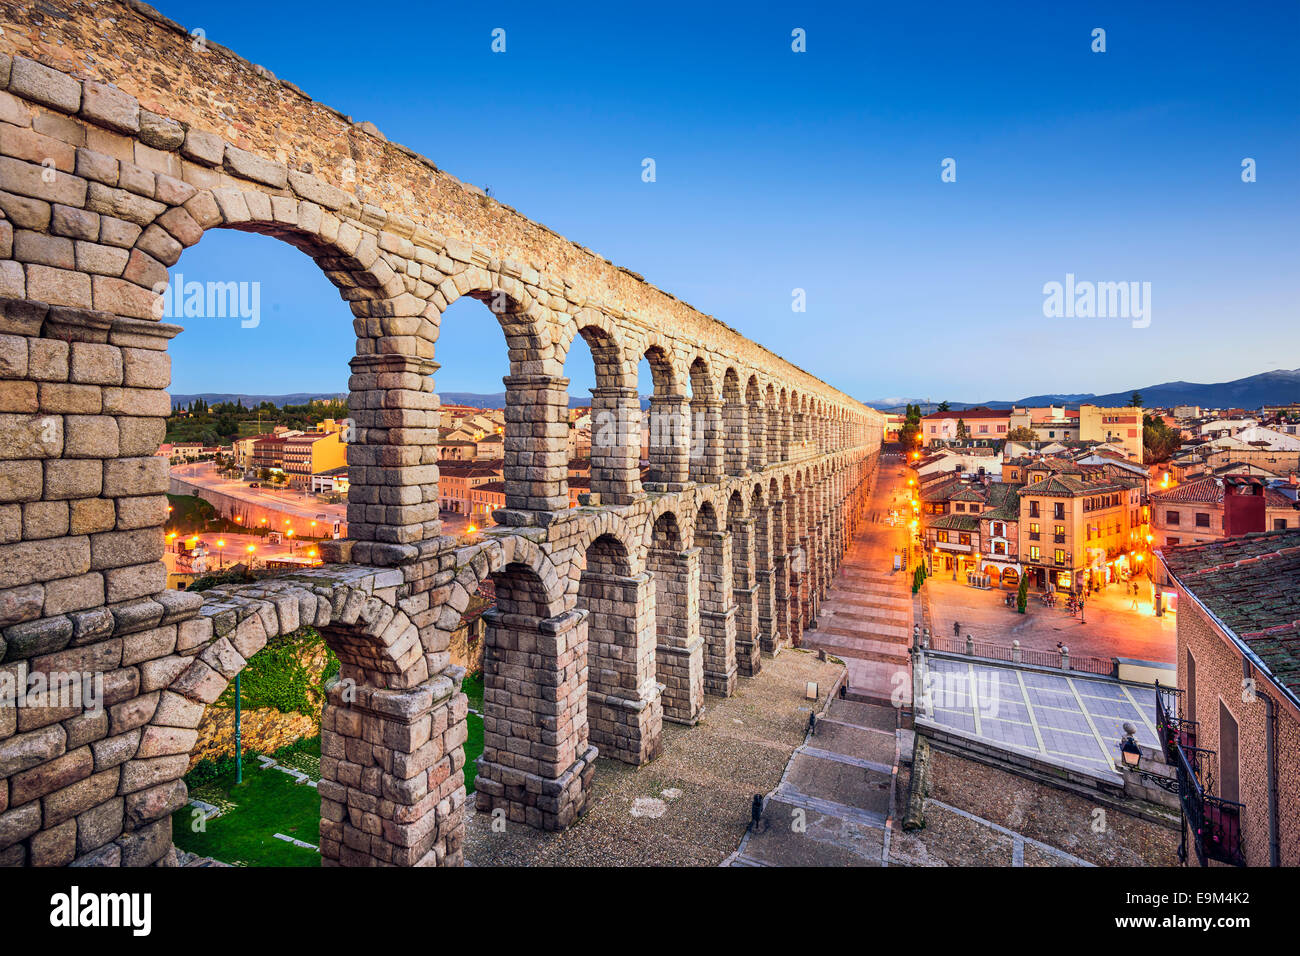 Segovia, Spanien in der antiken römischen Aquädukt. Stockbild